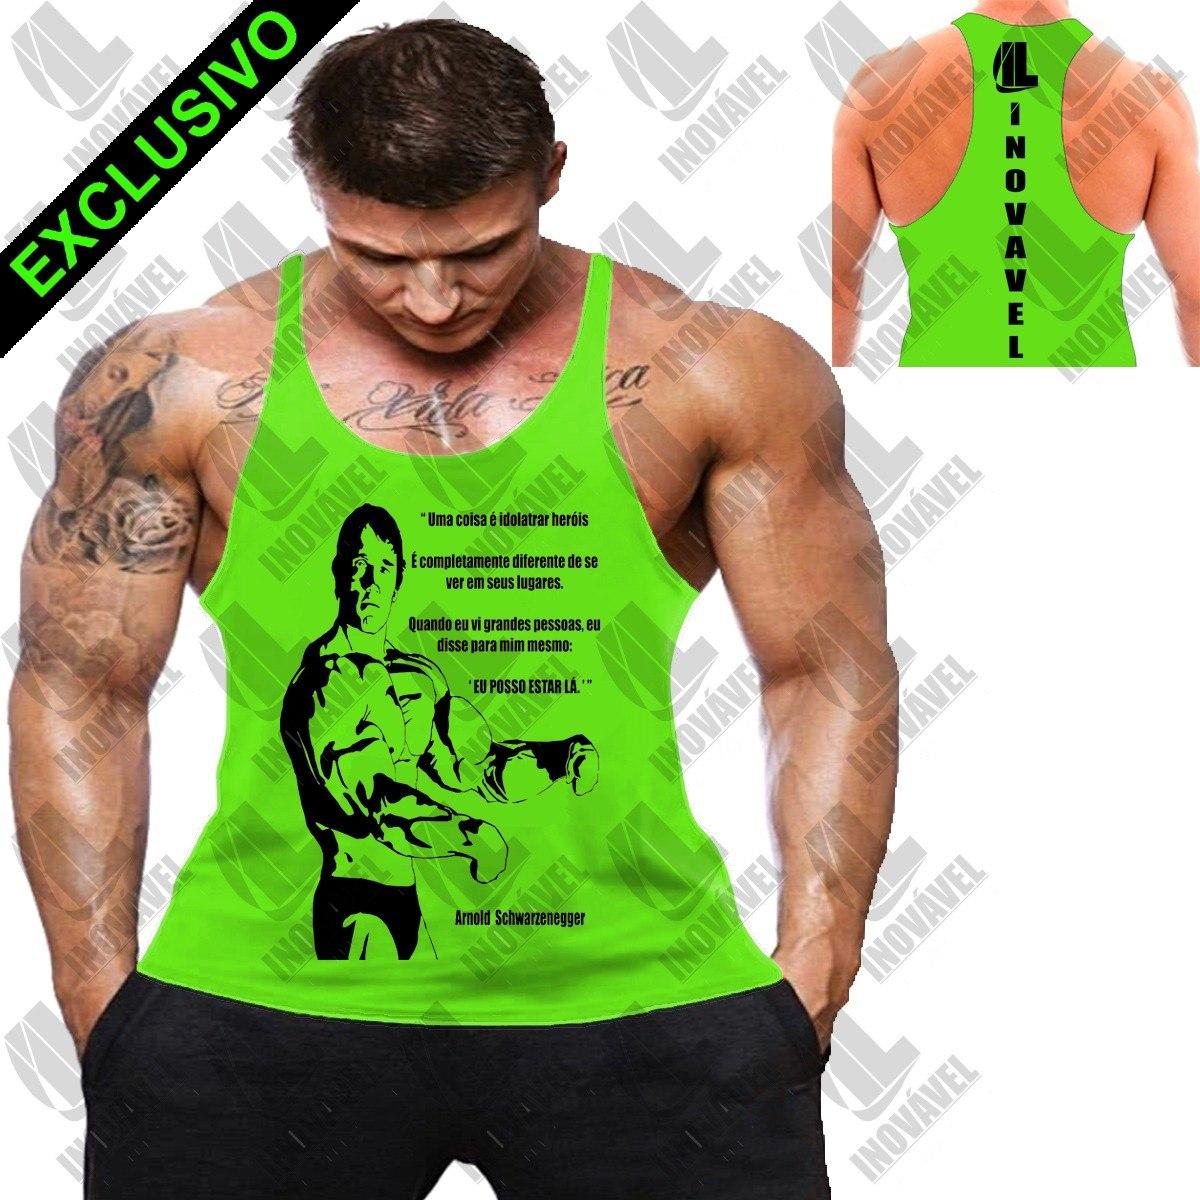 ccbbd0199b2a3 Marca inovavel modelo regata cavada gênero masculino material da camiseta  poliviscose jpg 1200x1200 Treino blusas herois